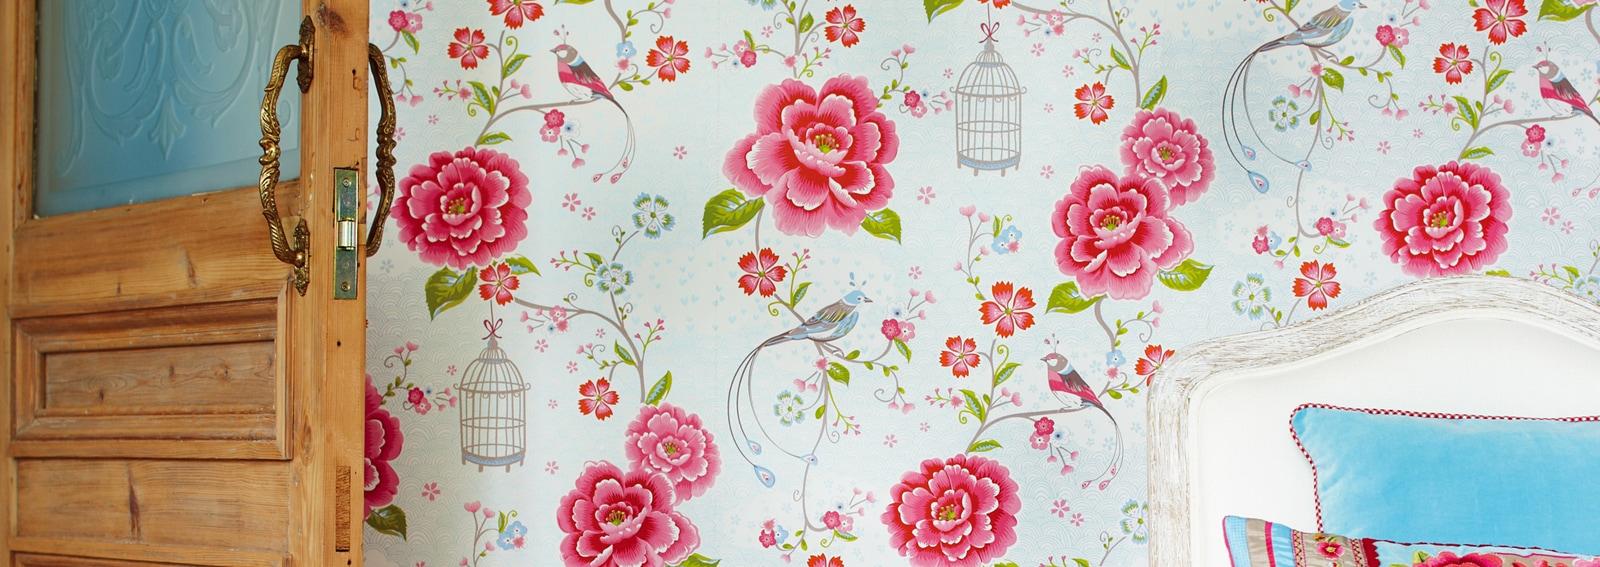 cover-carte-parati-fiori-desktop